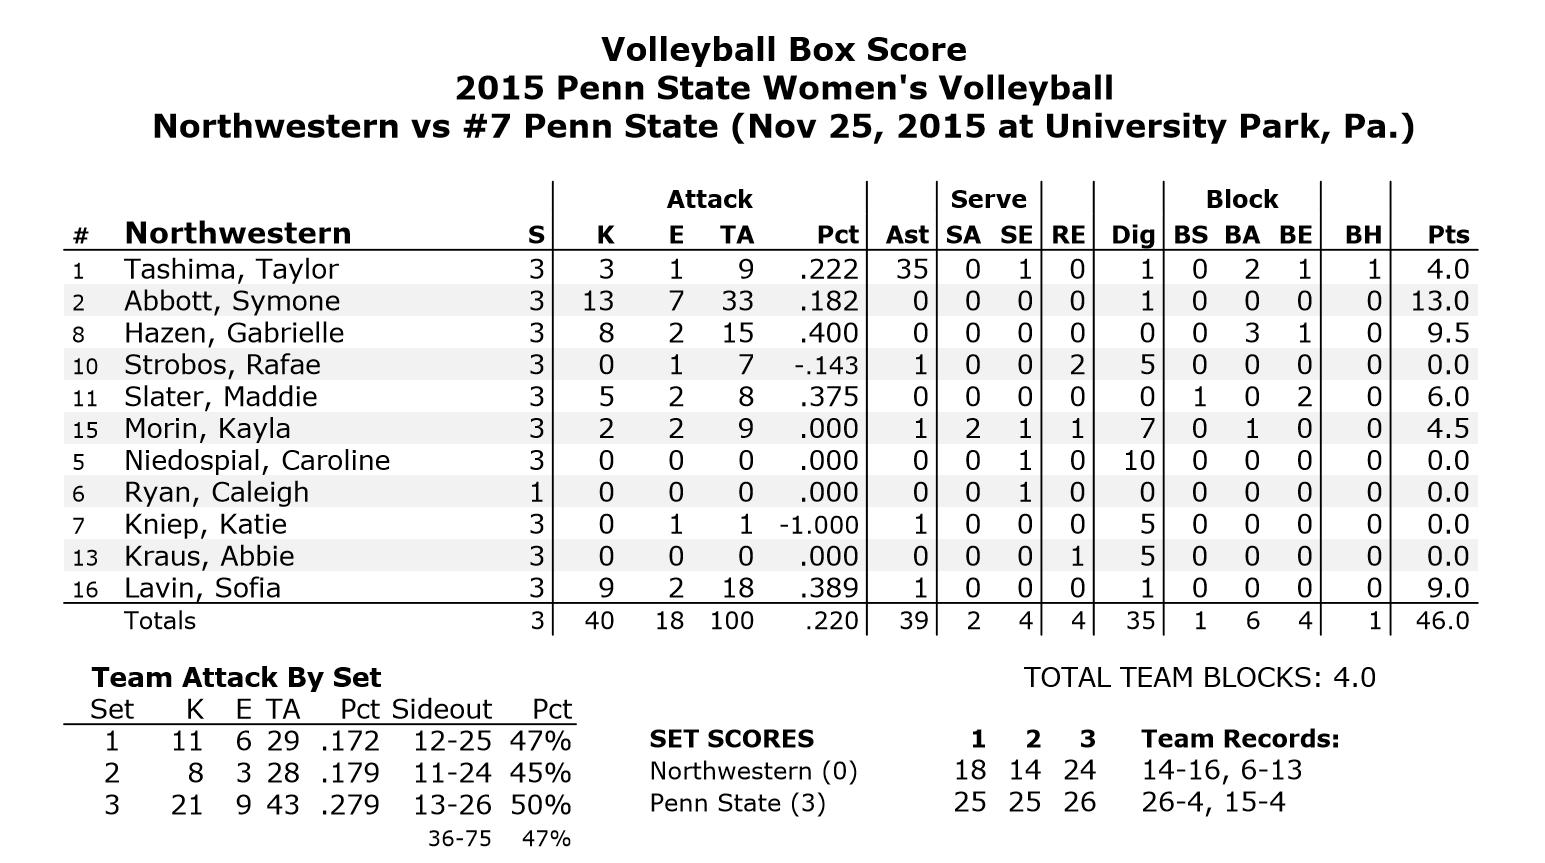 Northwestern Stats